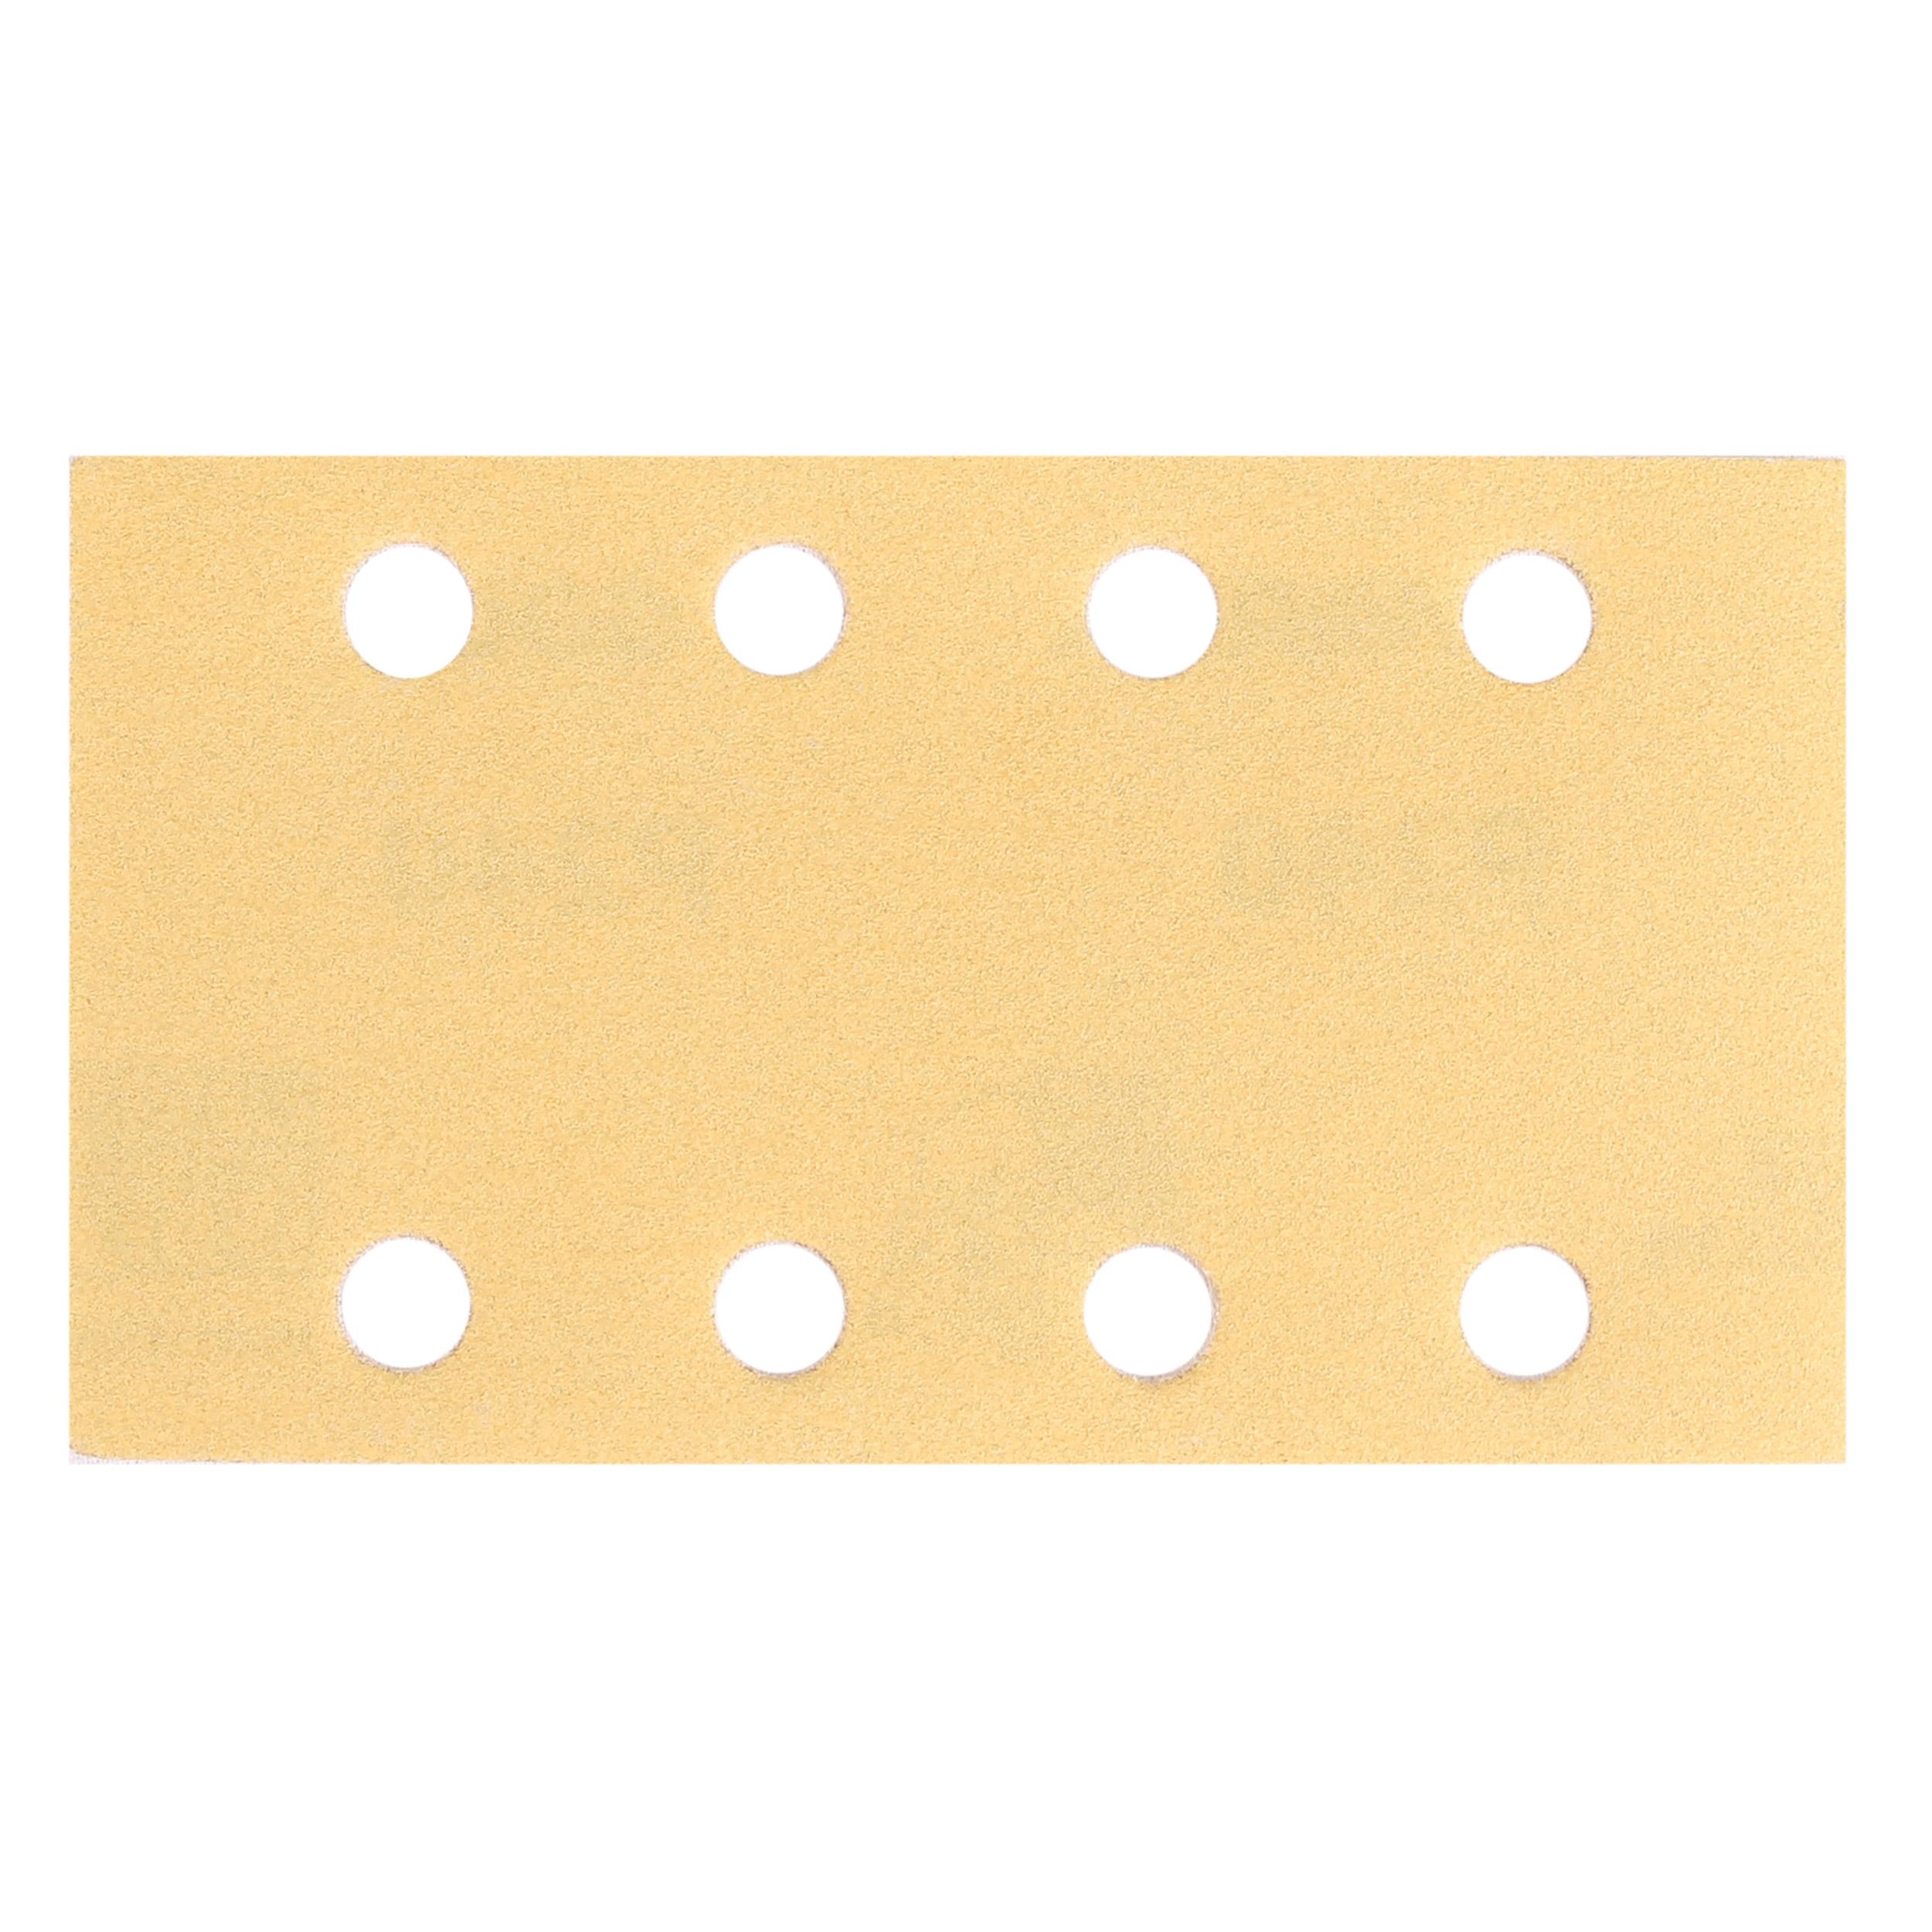 "GOLD 3""x5"" Grip Sandpaper, 8H P220, 50 Sheets/Box"